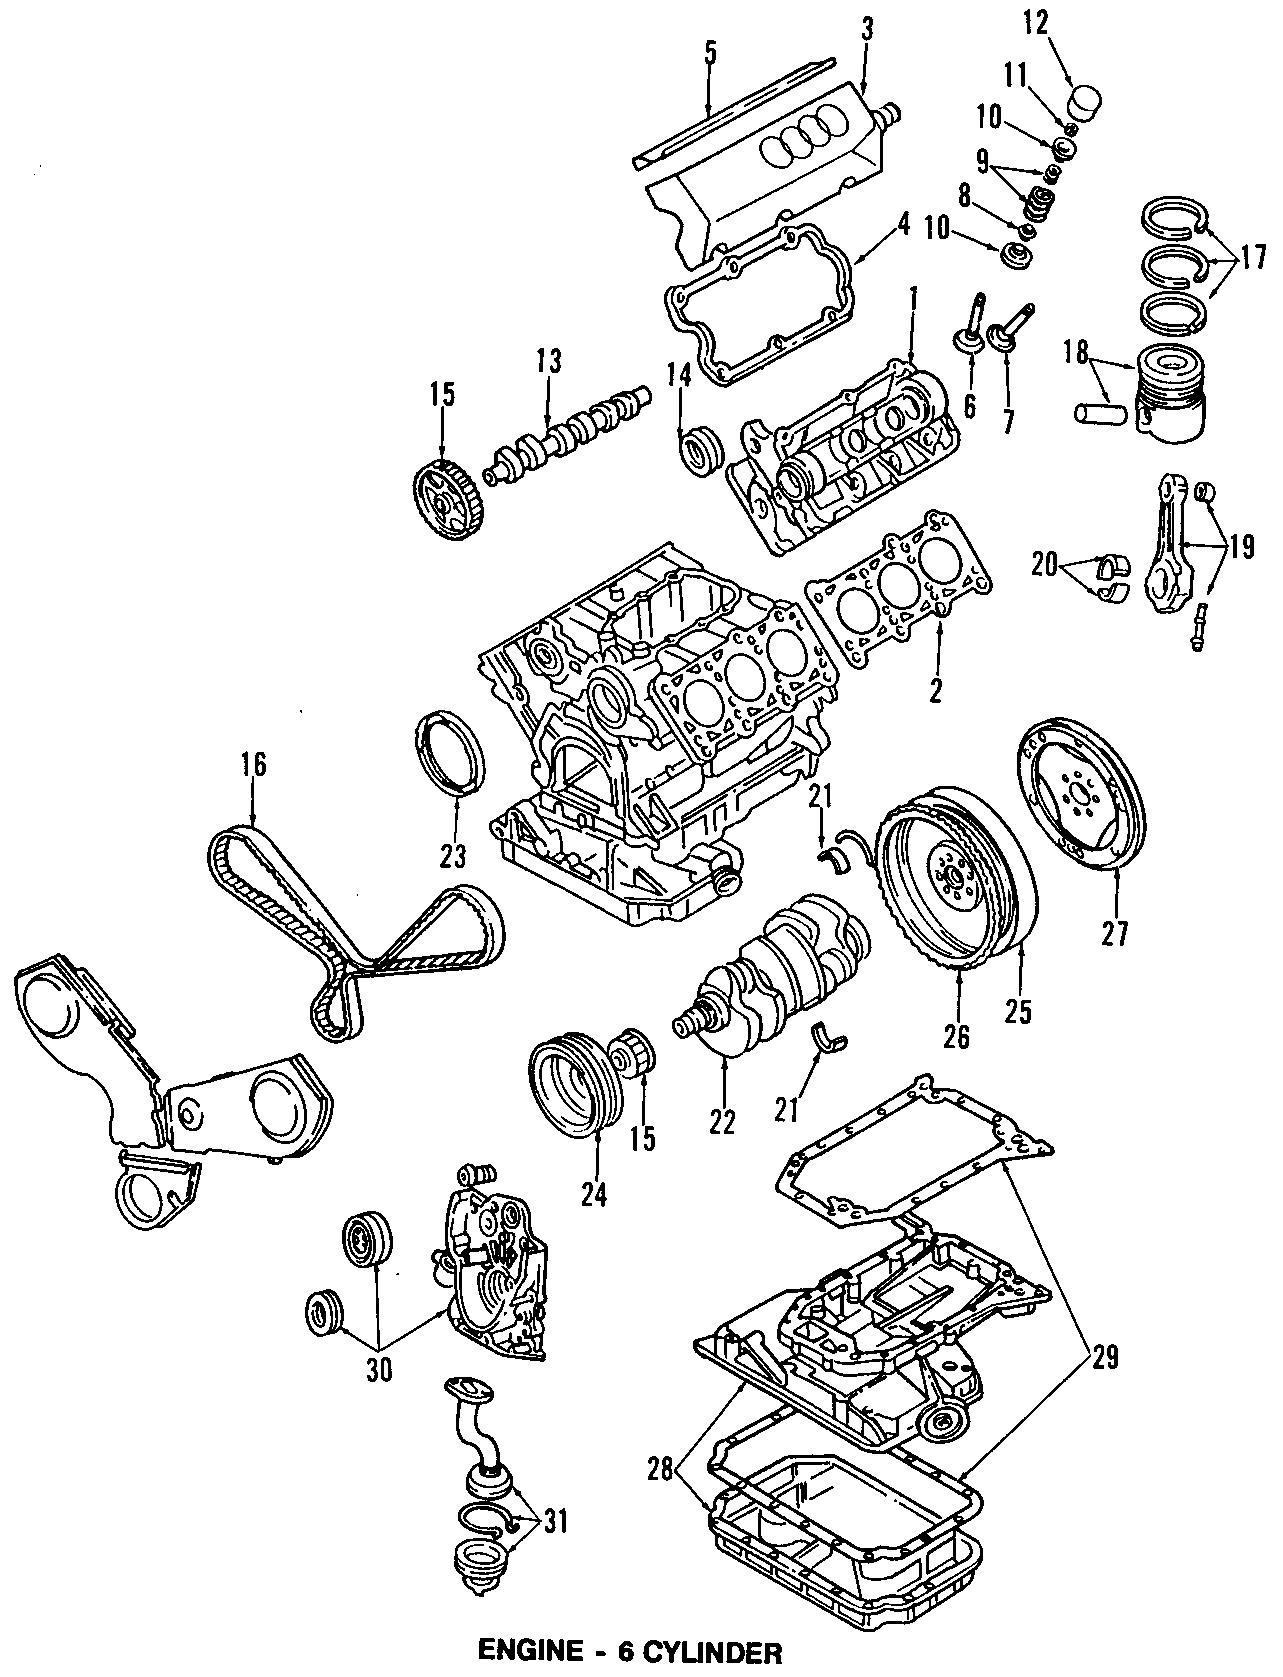 Audi A4 Engine Oil Cooler Liter Vin Bearings